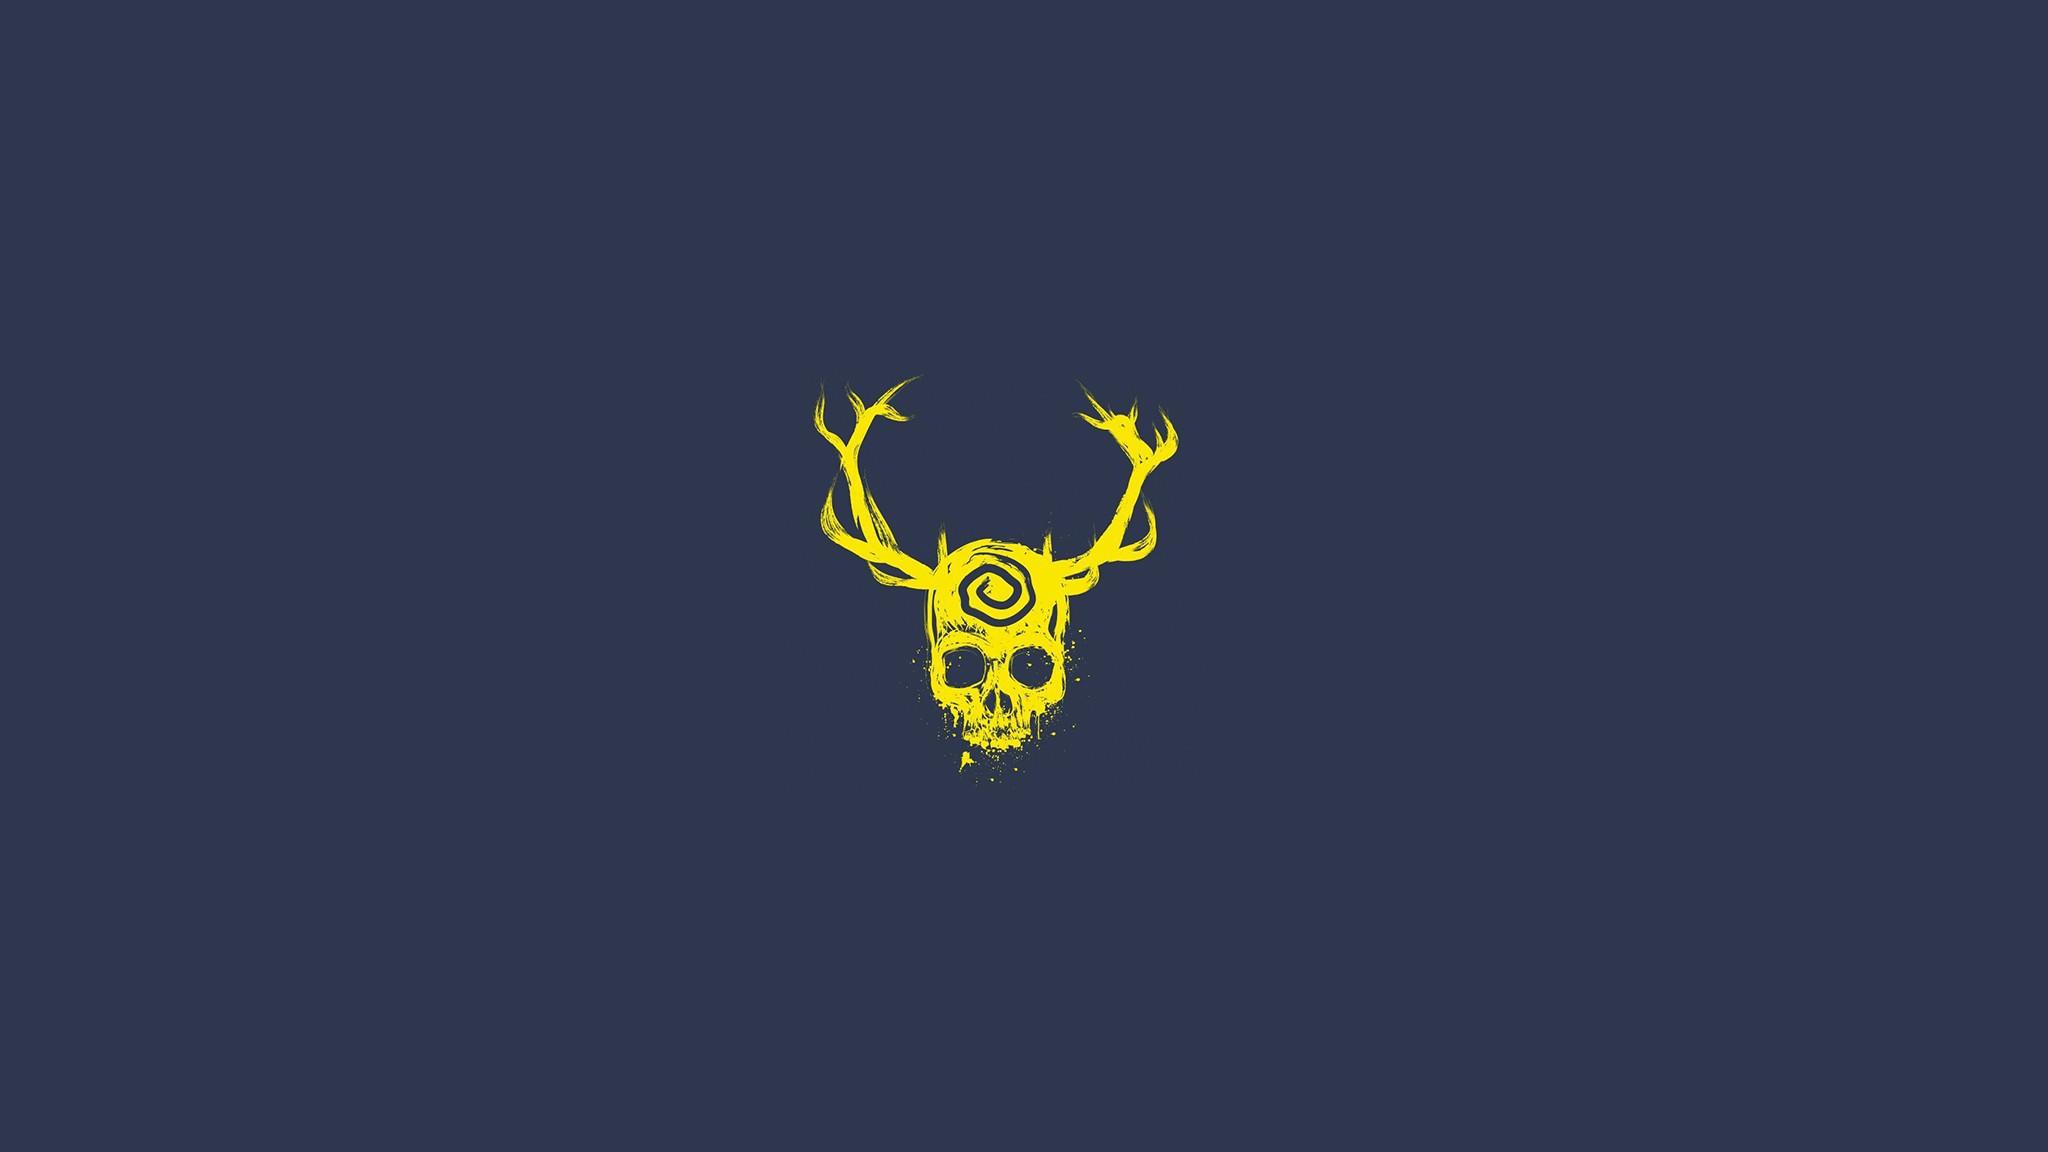 Skull minimalist hd artist 4k wallpapers images for Immagini minimal